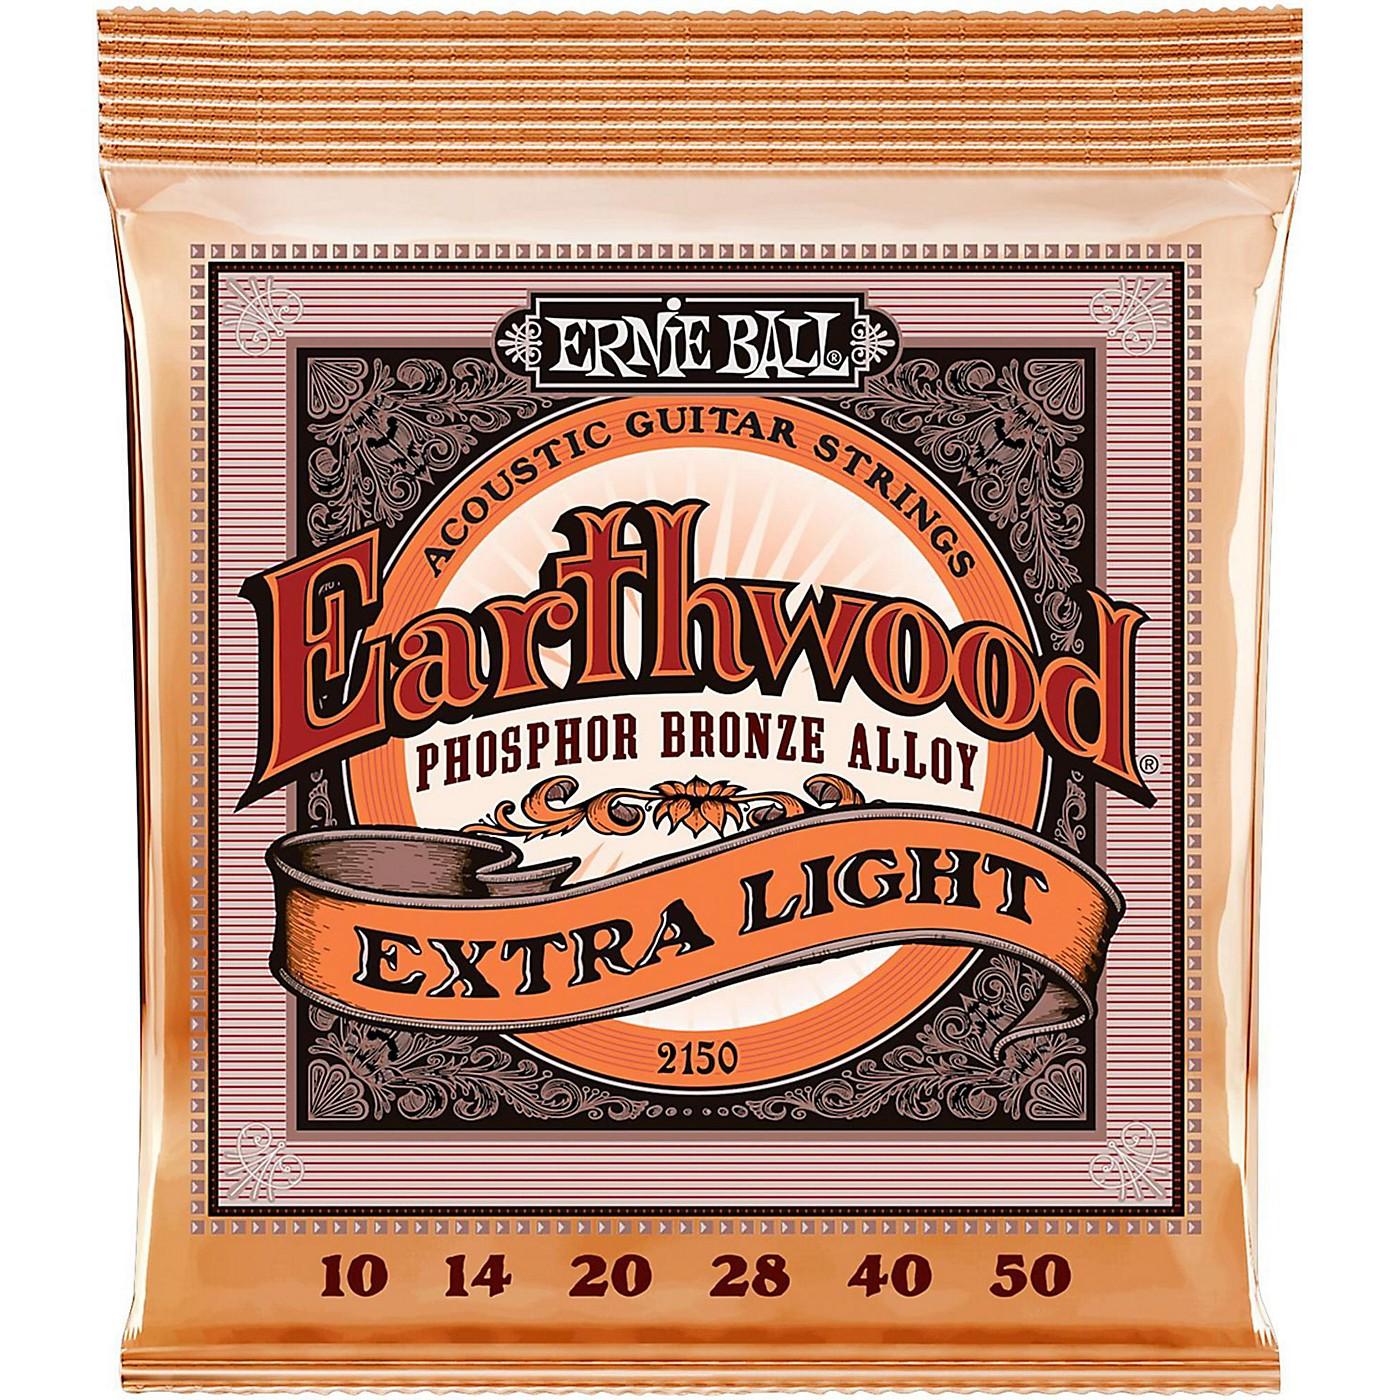 Ernie Ball 2150 Earthwood Phosphor Bronze Extra Light Acoustic Guitar Strings thumbnail